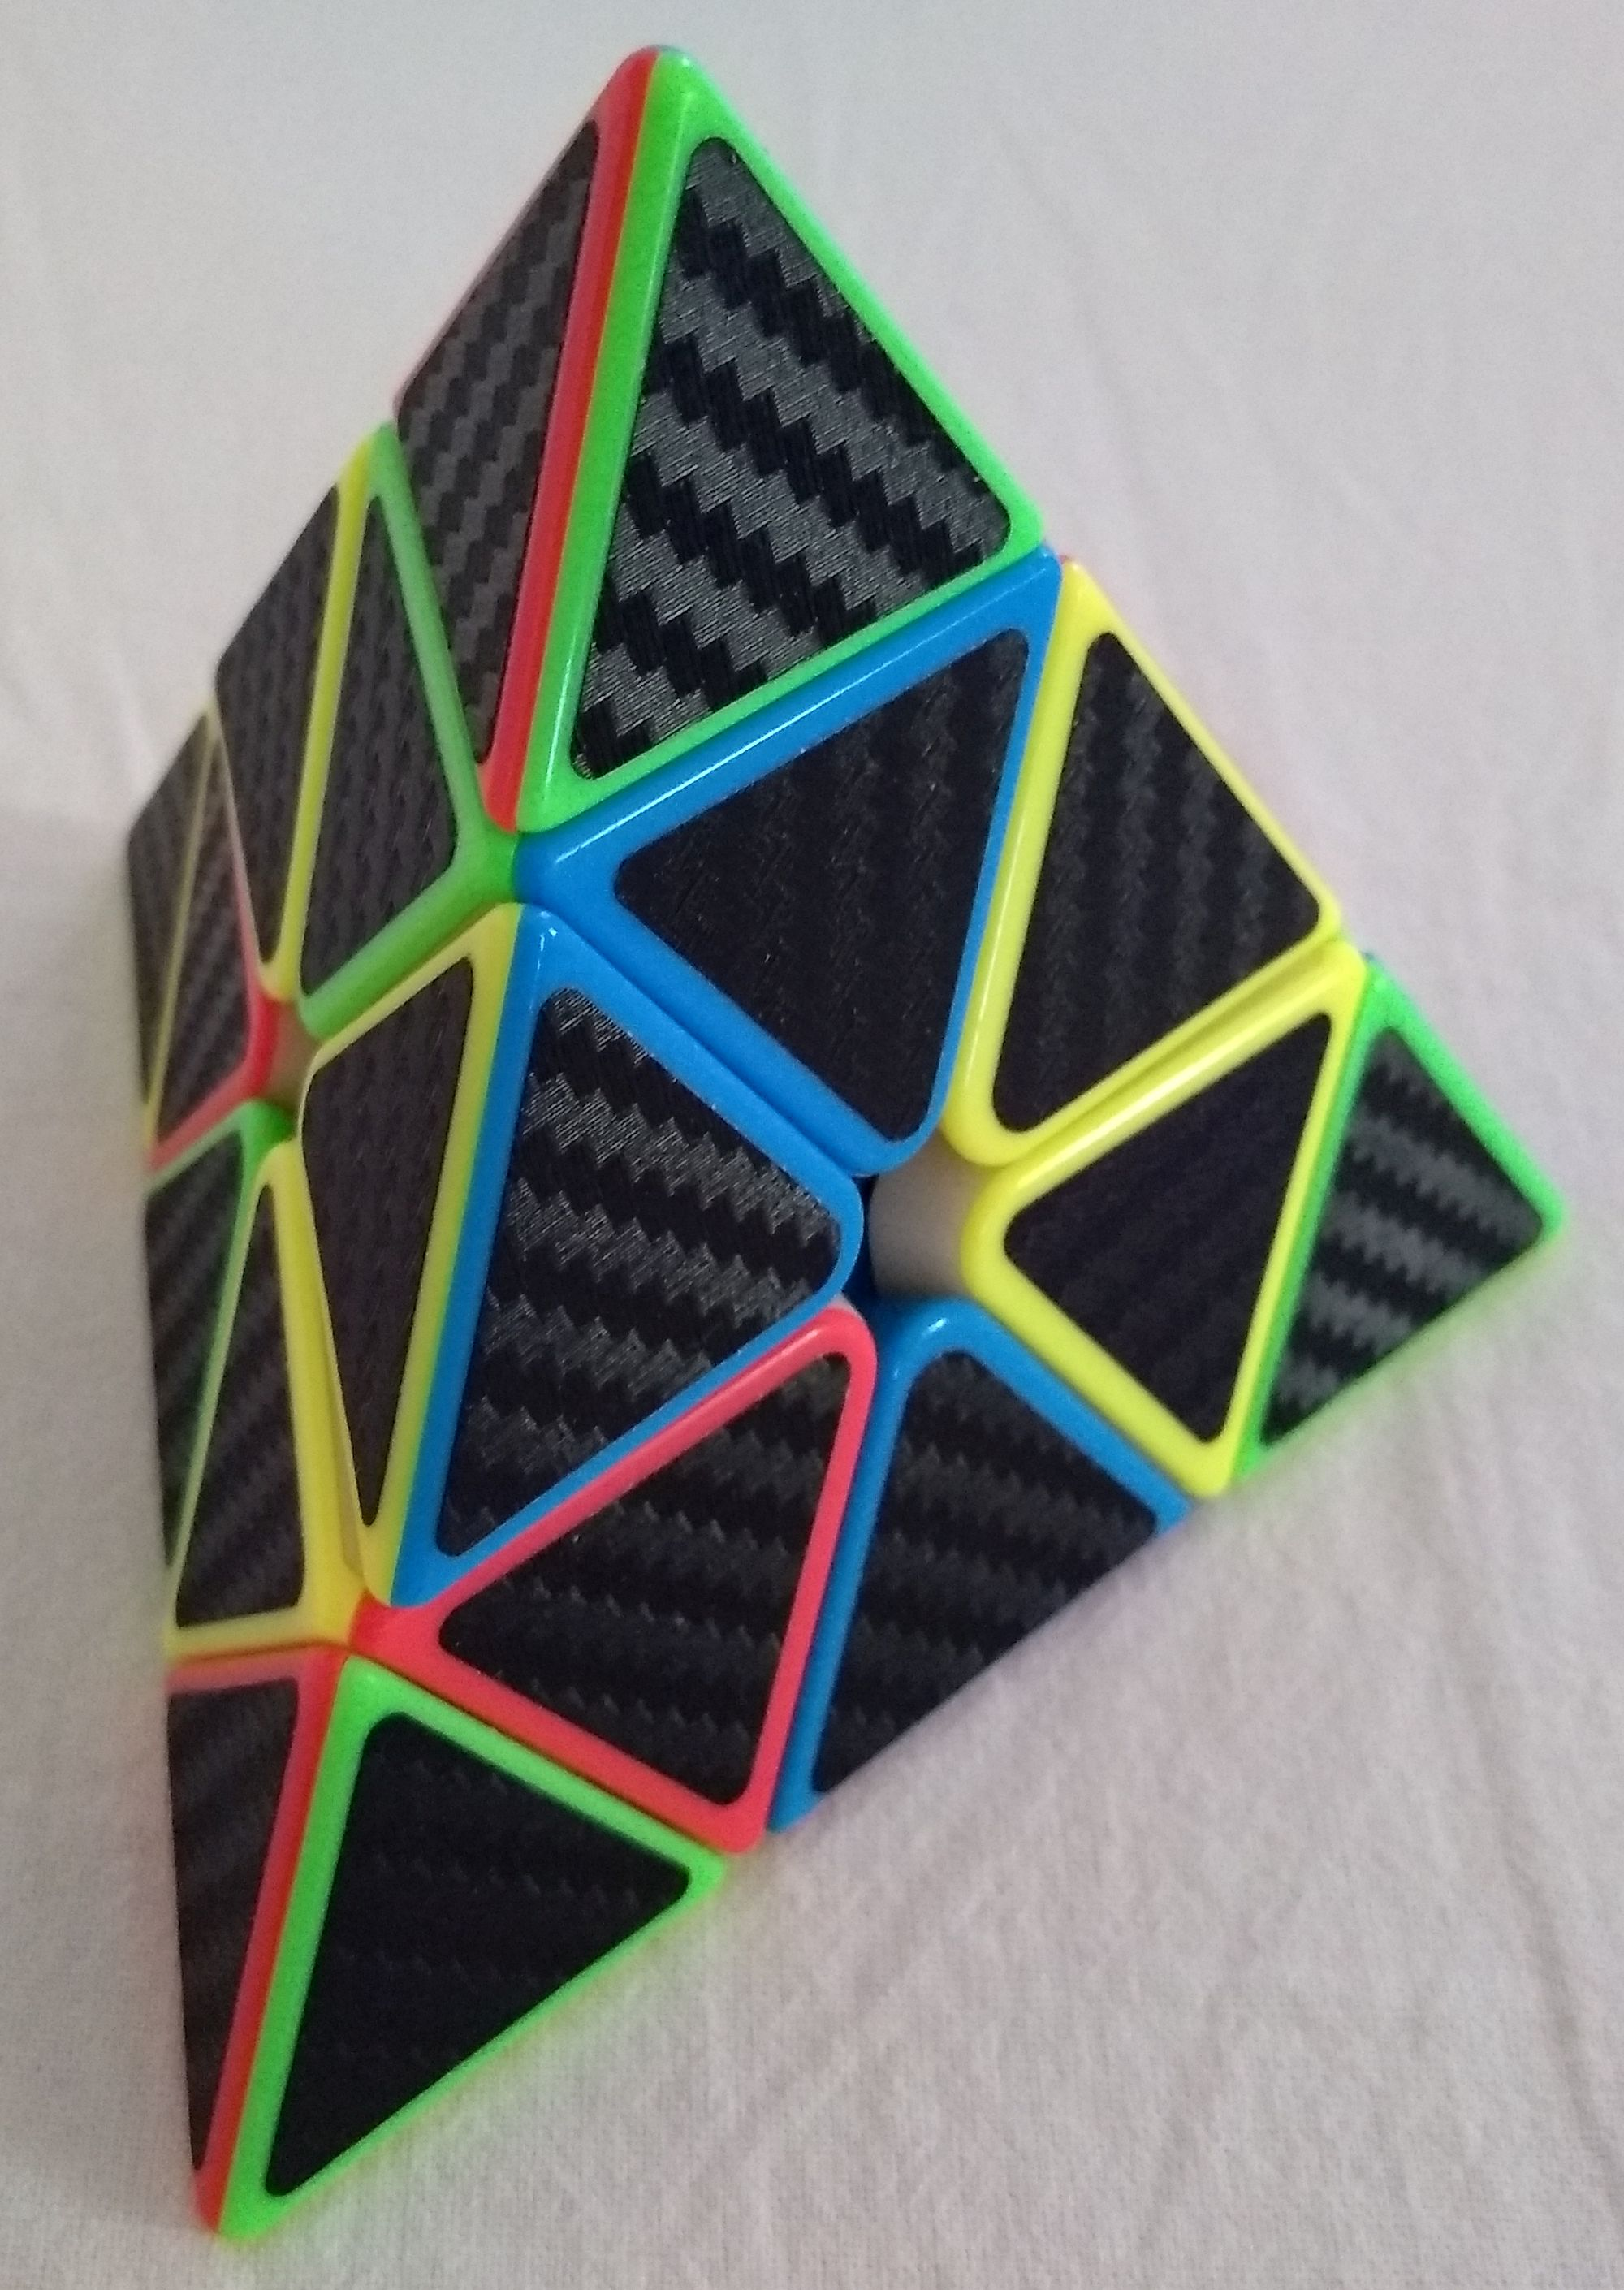 Pyraminx scrambled